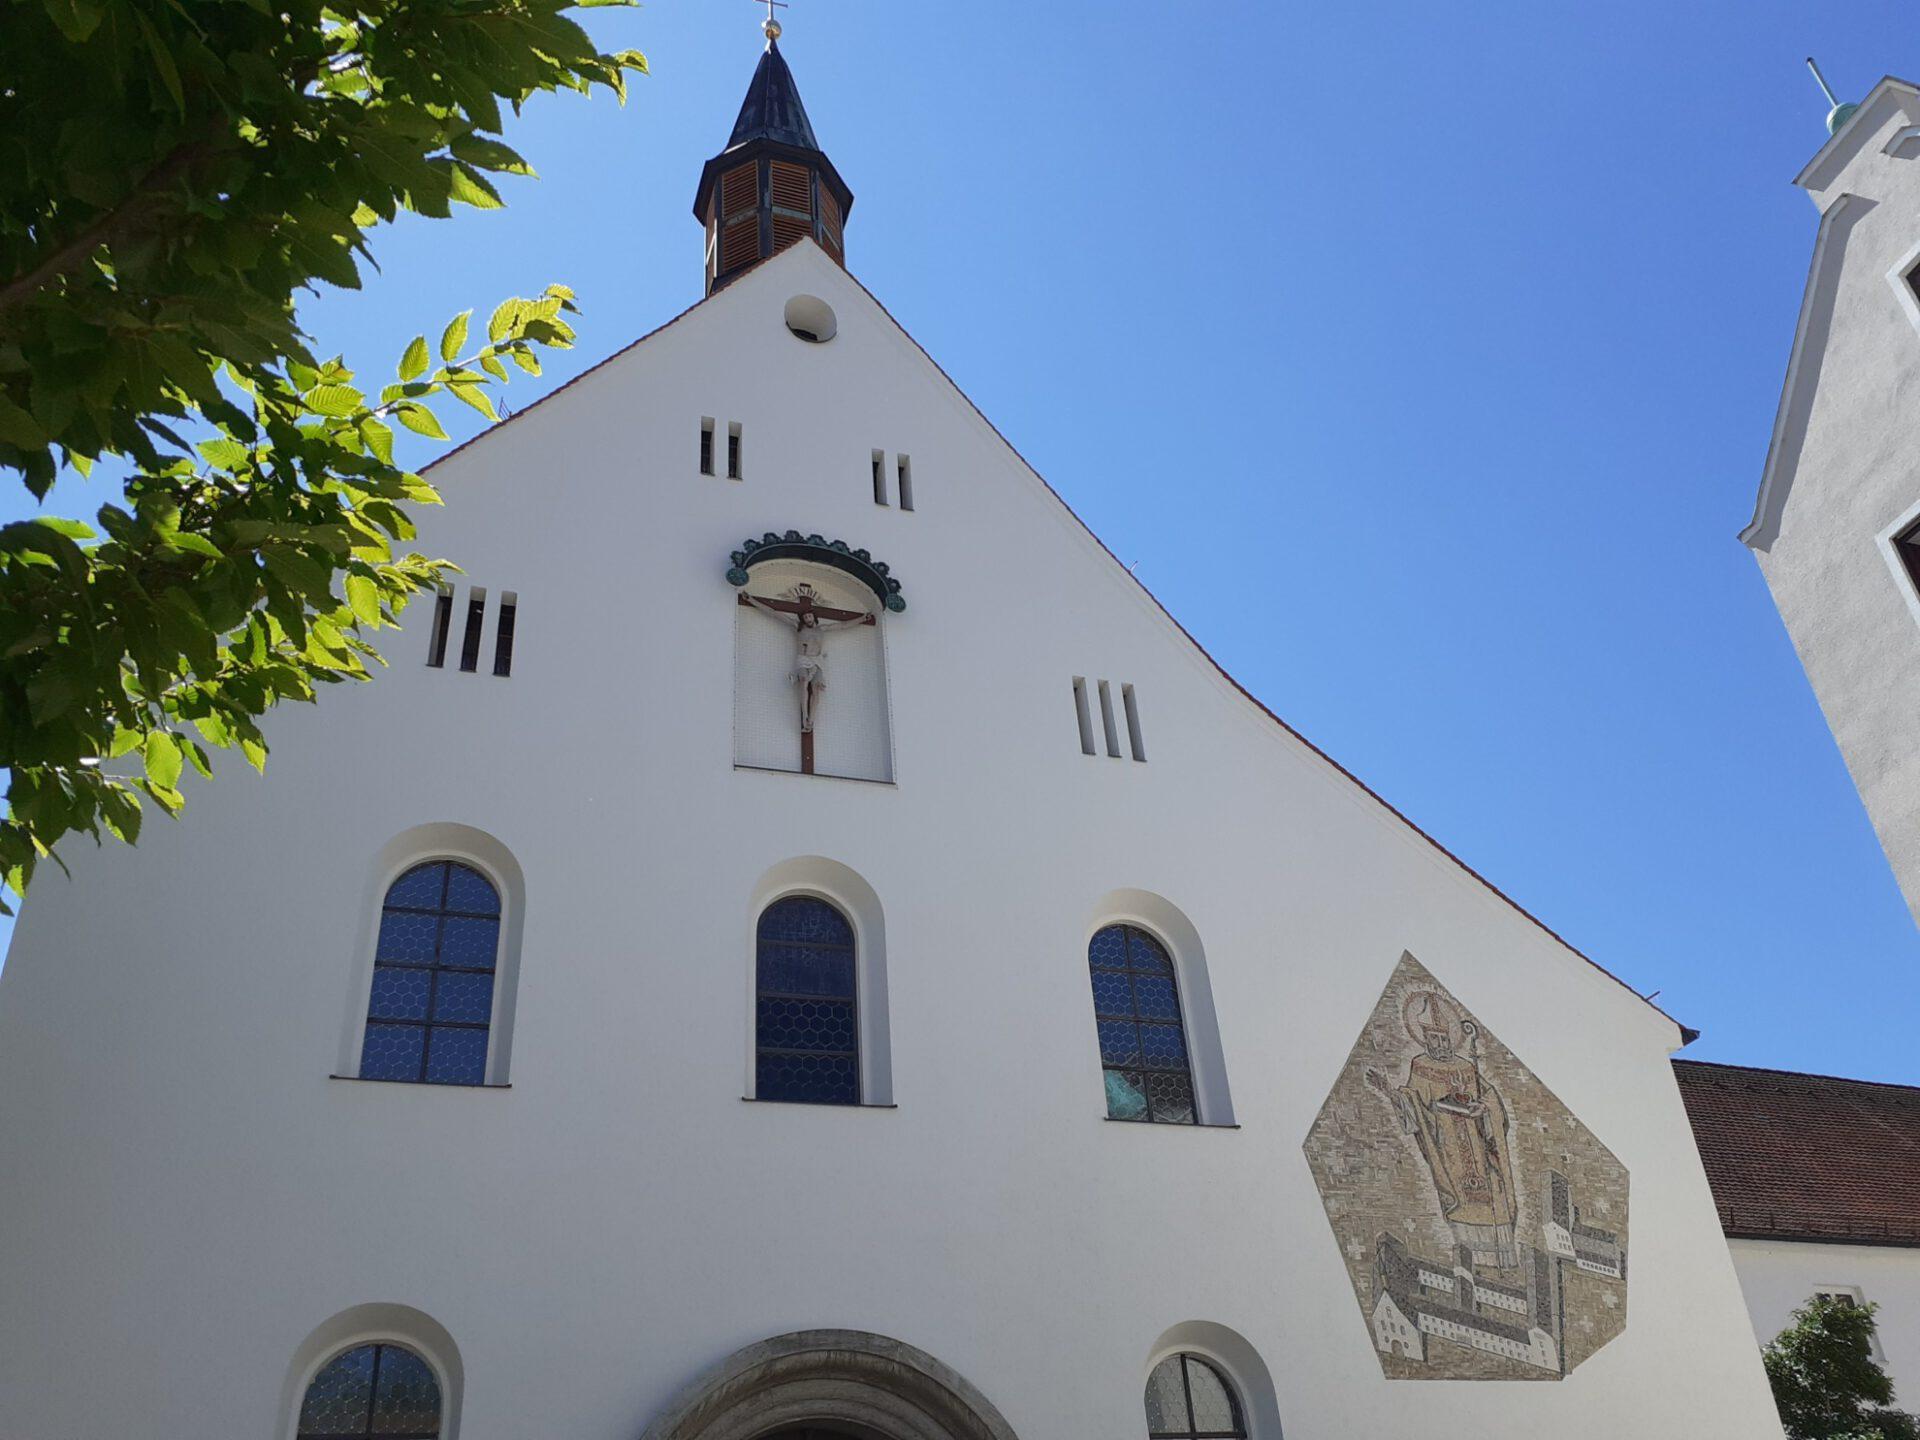 Klosterkirche St. Augustin Neuburg